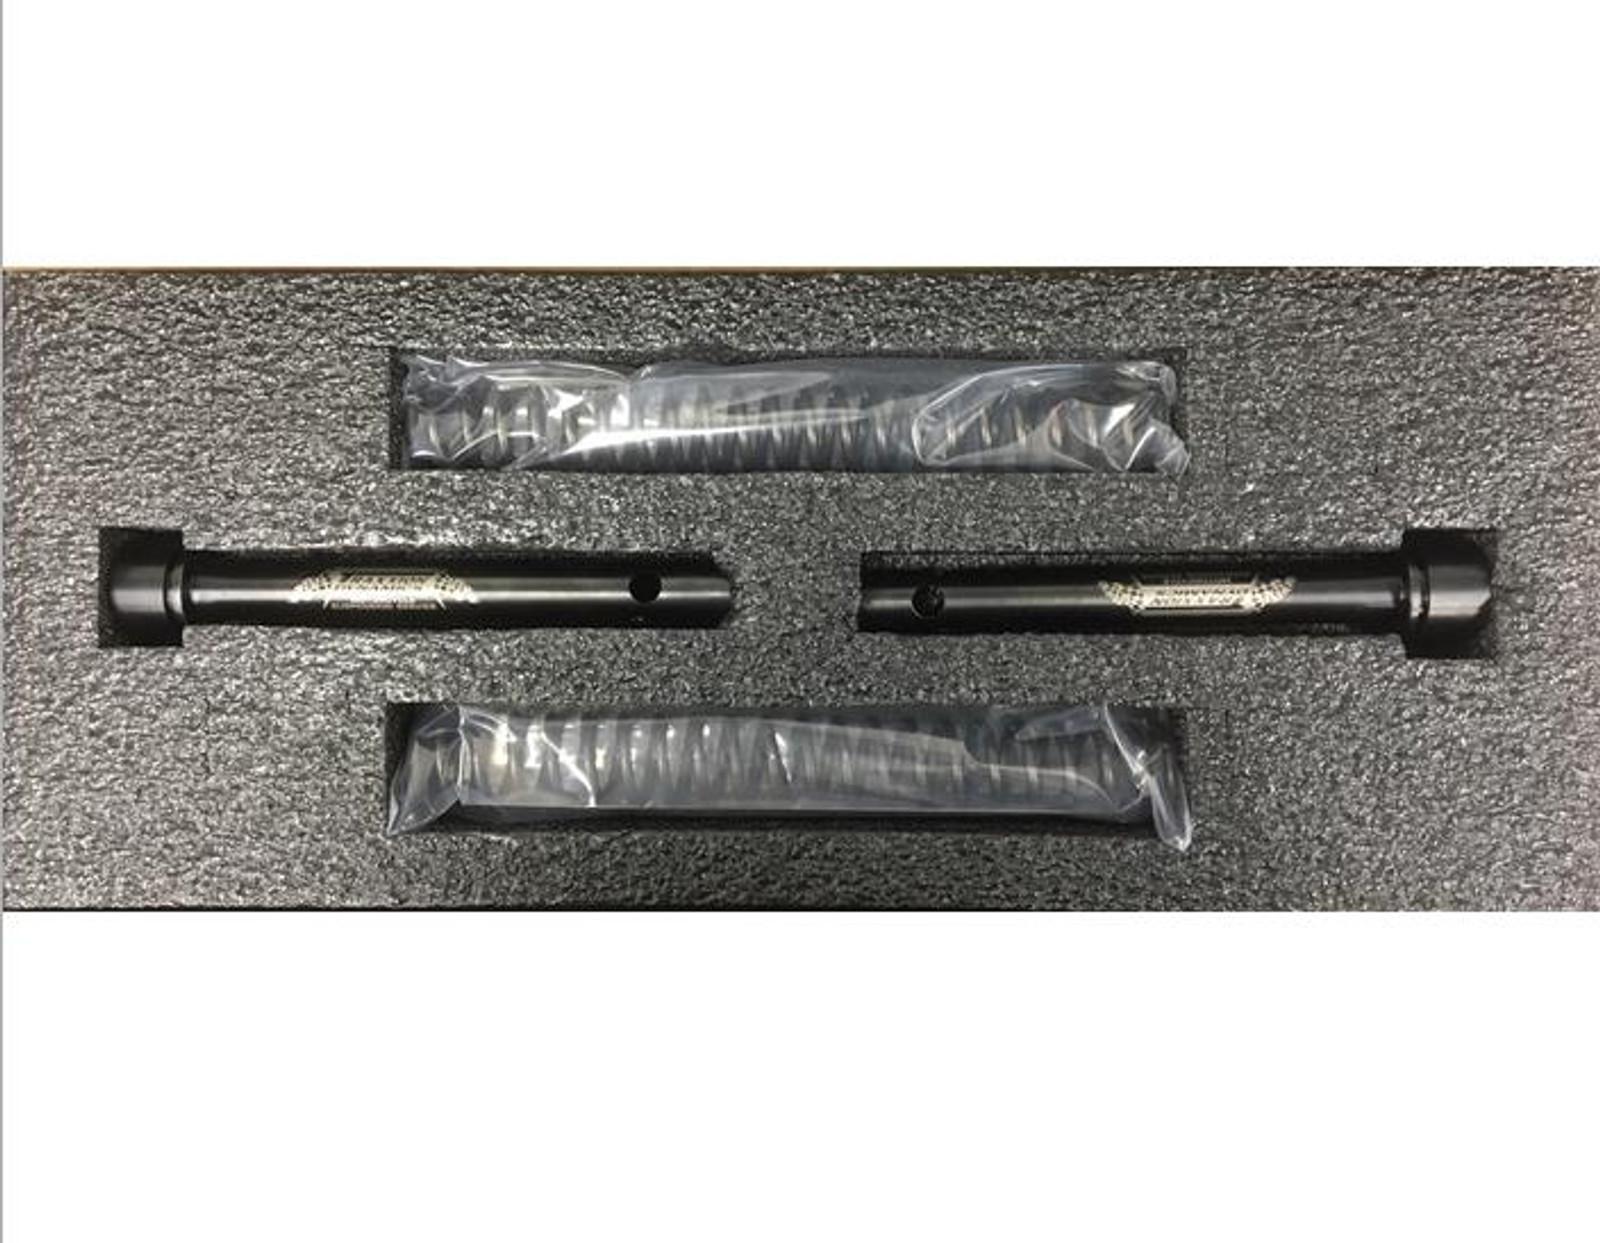 Traxxion Dynamics AR-25 Damper Rod Upgrade Kit for Harley Davidson